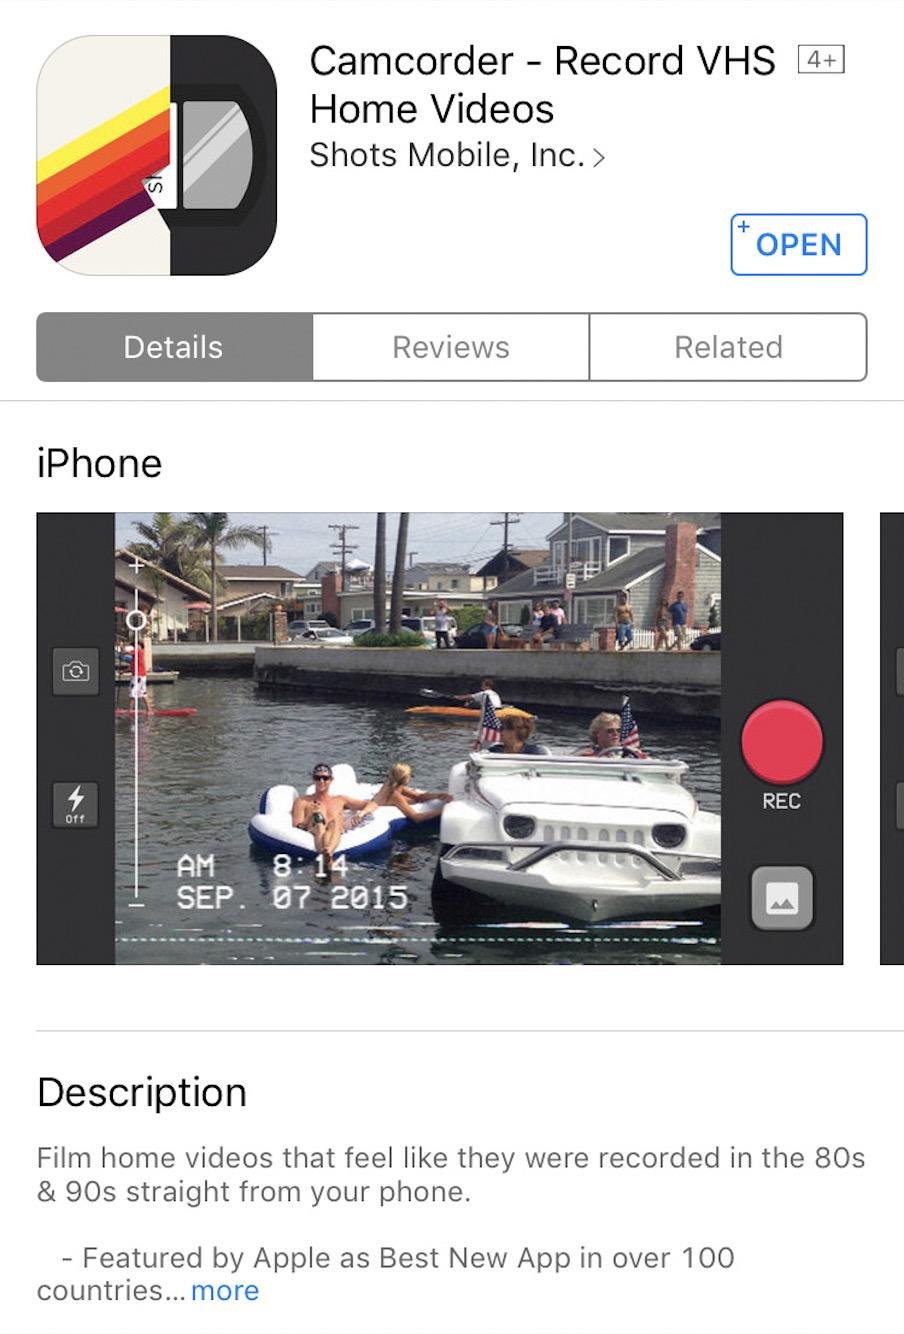 Top Instagram Apps - Camcorder